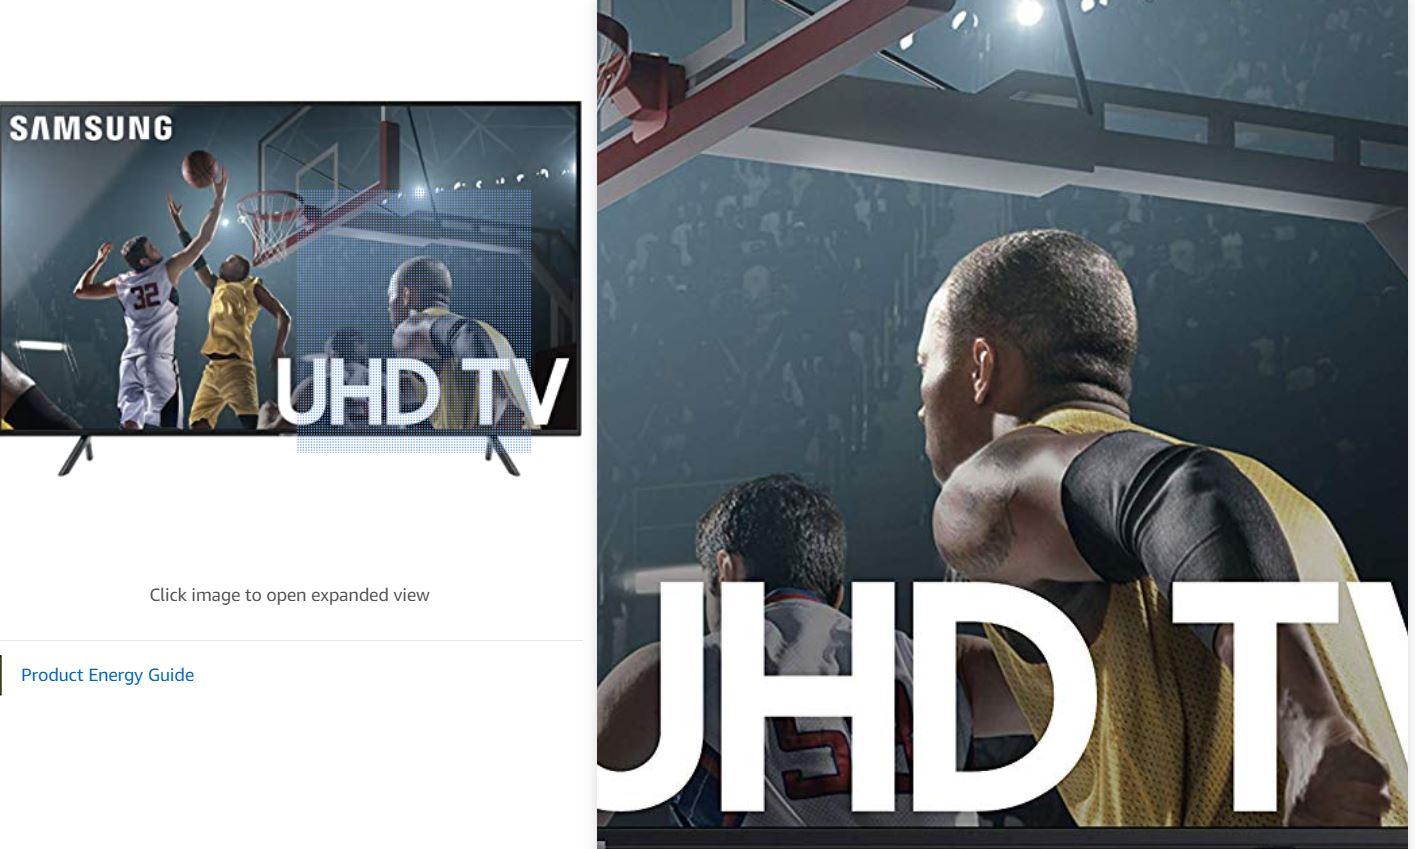 Product photo: Samsung UHD TV